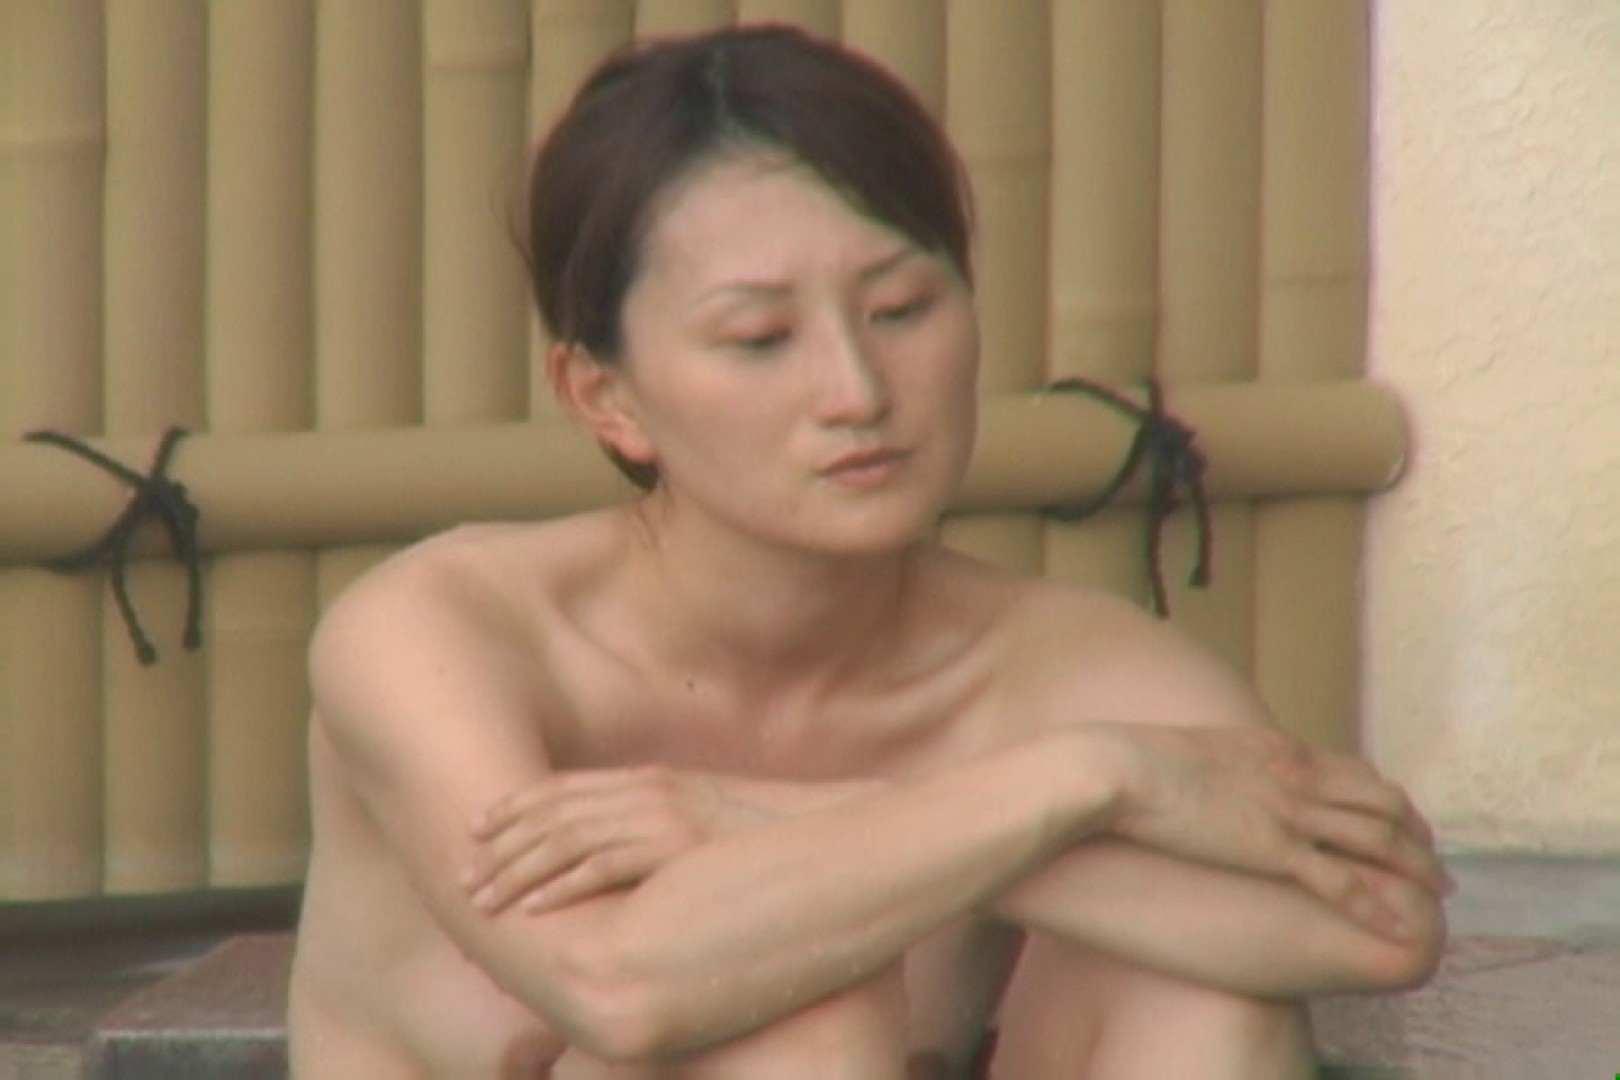 Aquaな露天風呂Vol.578 OL女体 われめAV動画紹介 77連発 59